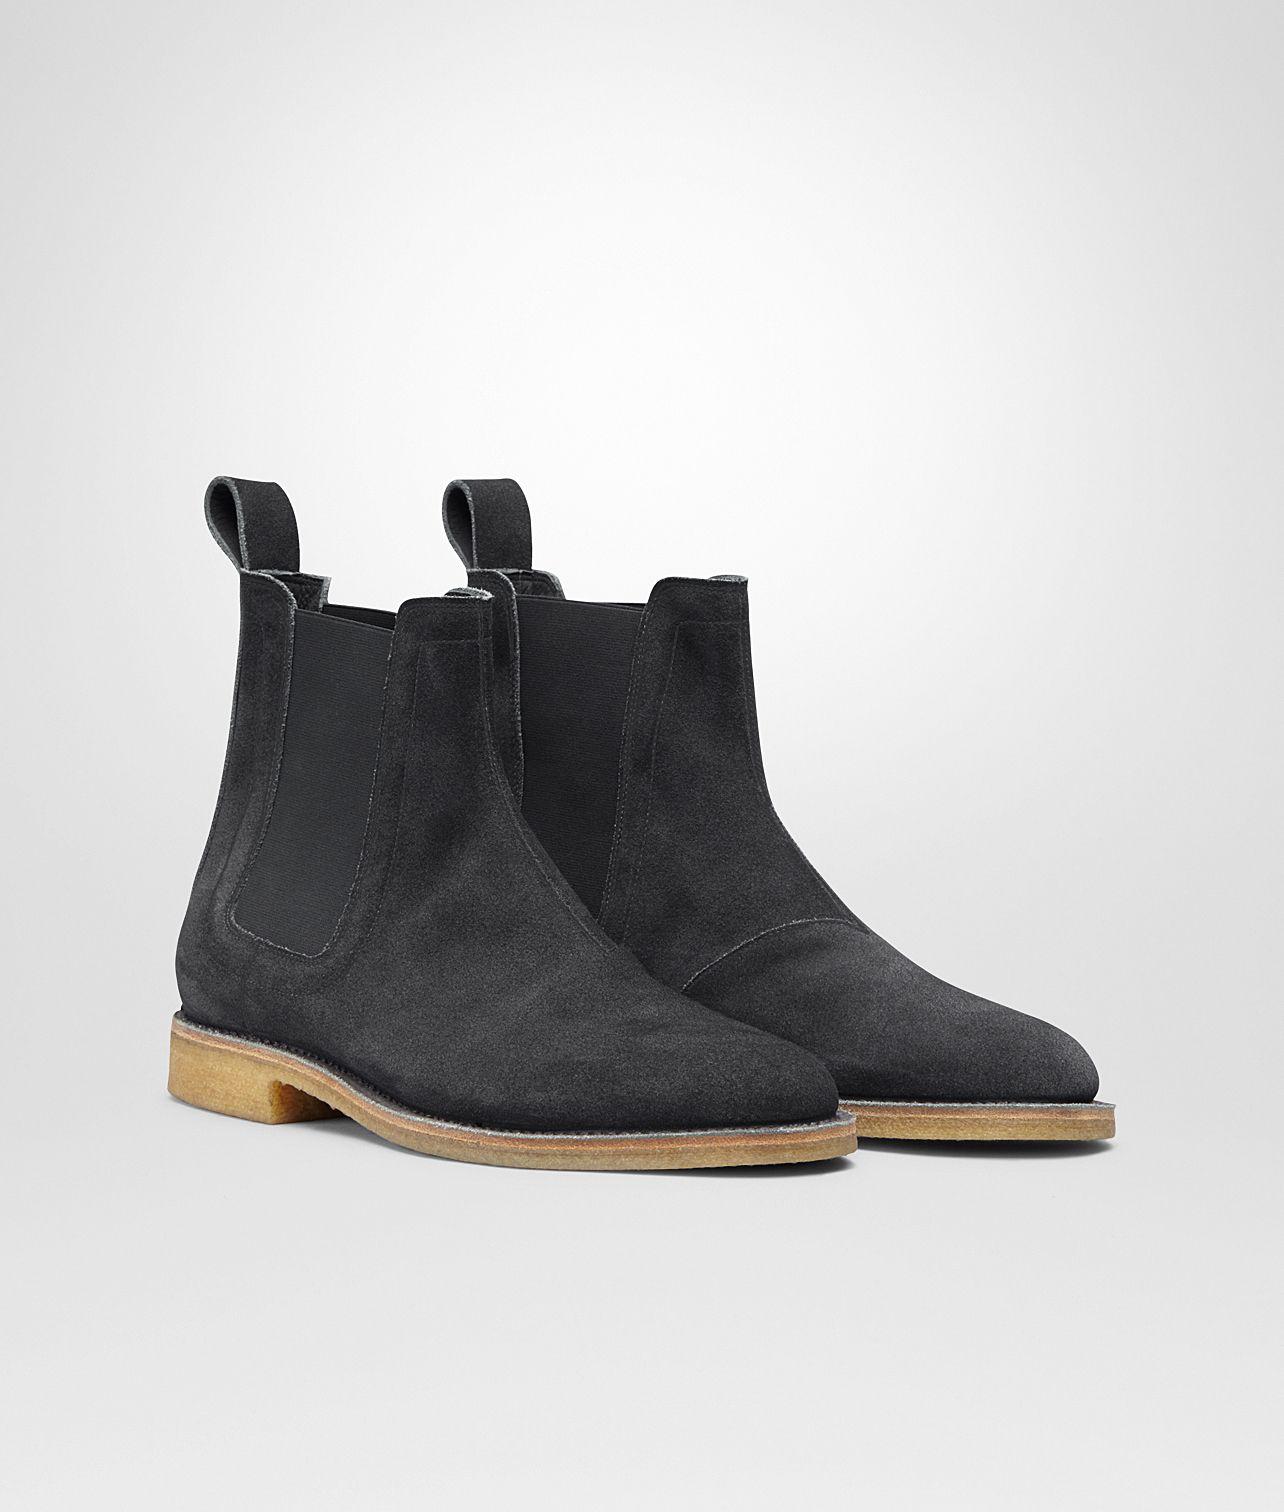 ARDOISE SUEDE DESERT BOOT - Men's Bottega Veneta® - Shop at the Official  Online Store